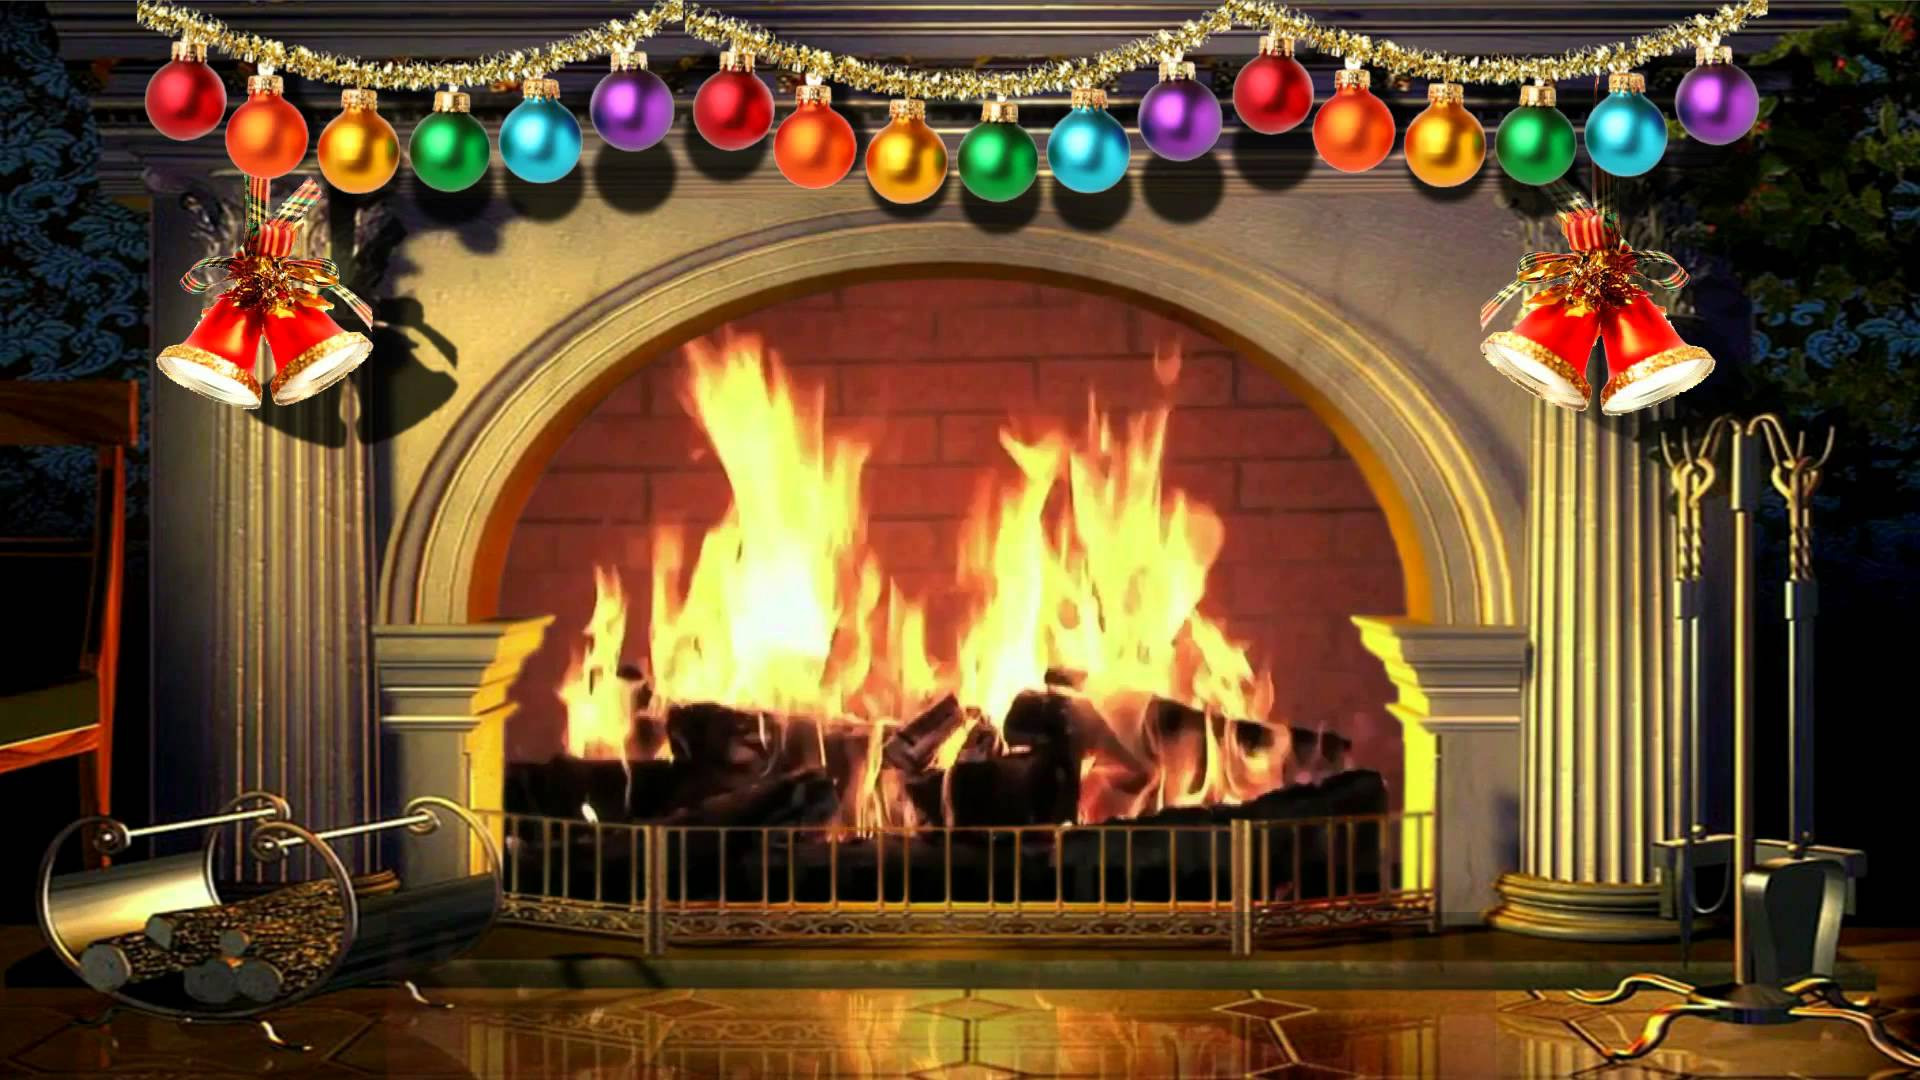 Christmas Fireplace Screensaver  Christmas Fireplace Backgrounds Wallpaper Cave